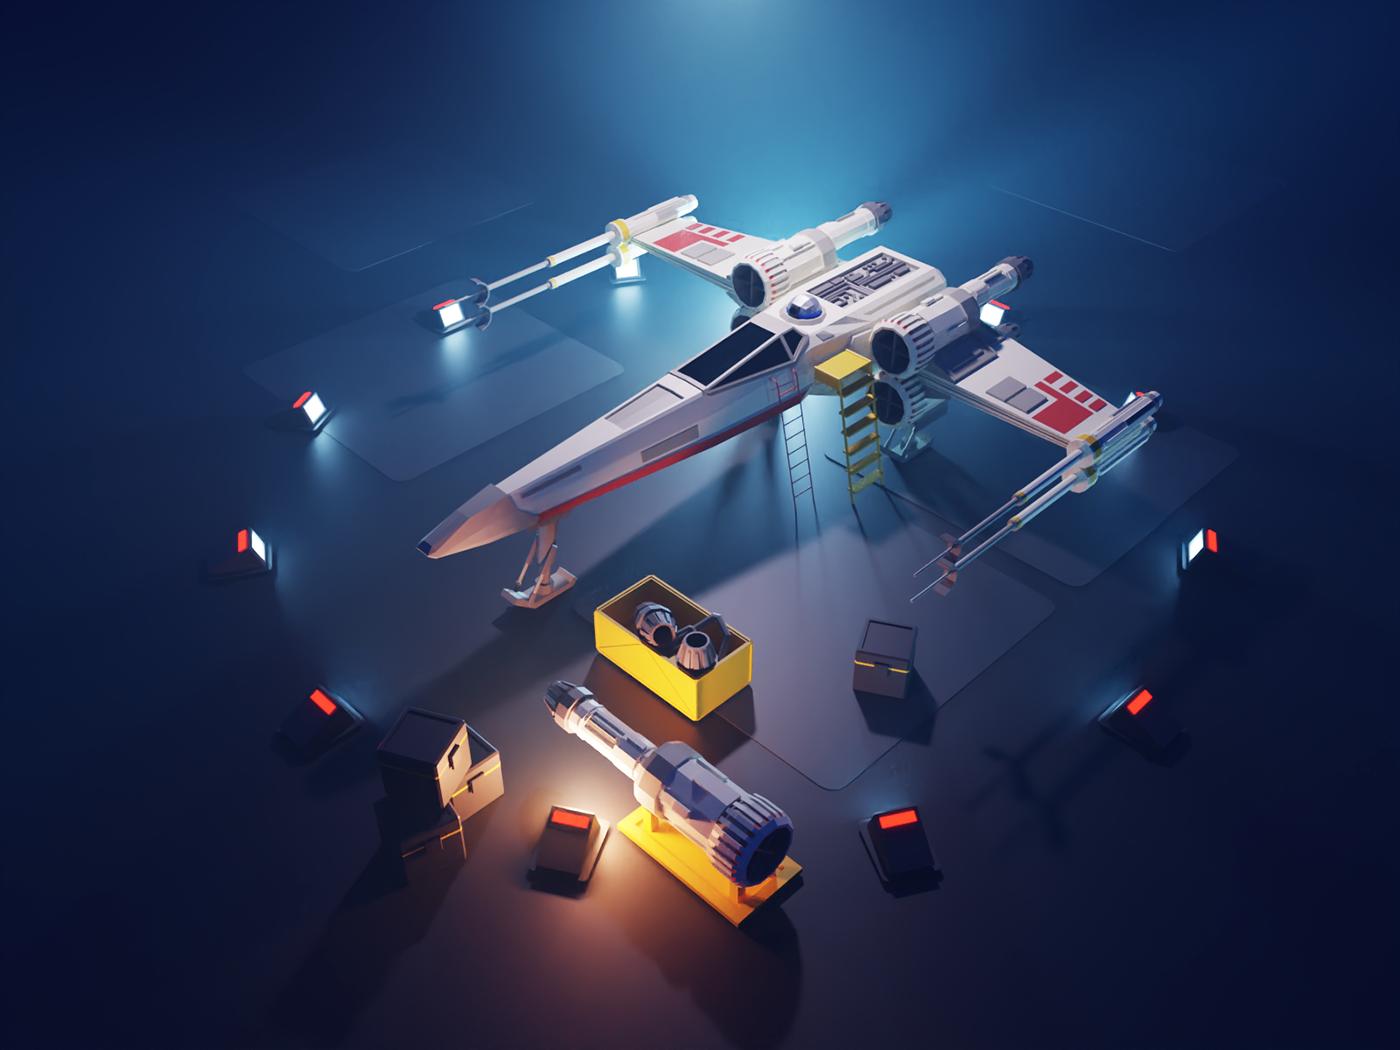 X-wing in the hangar